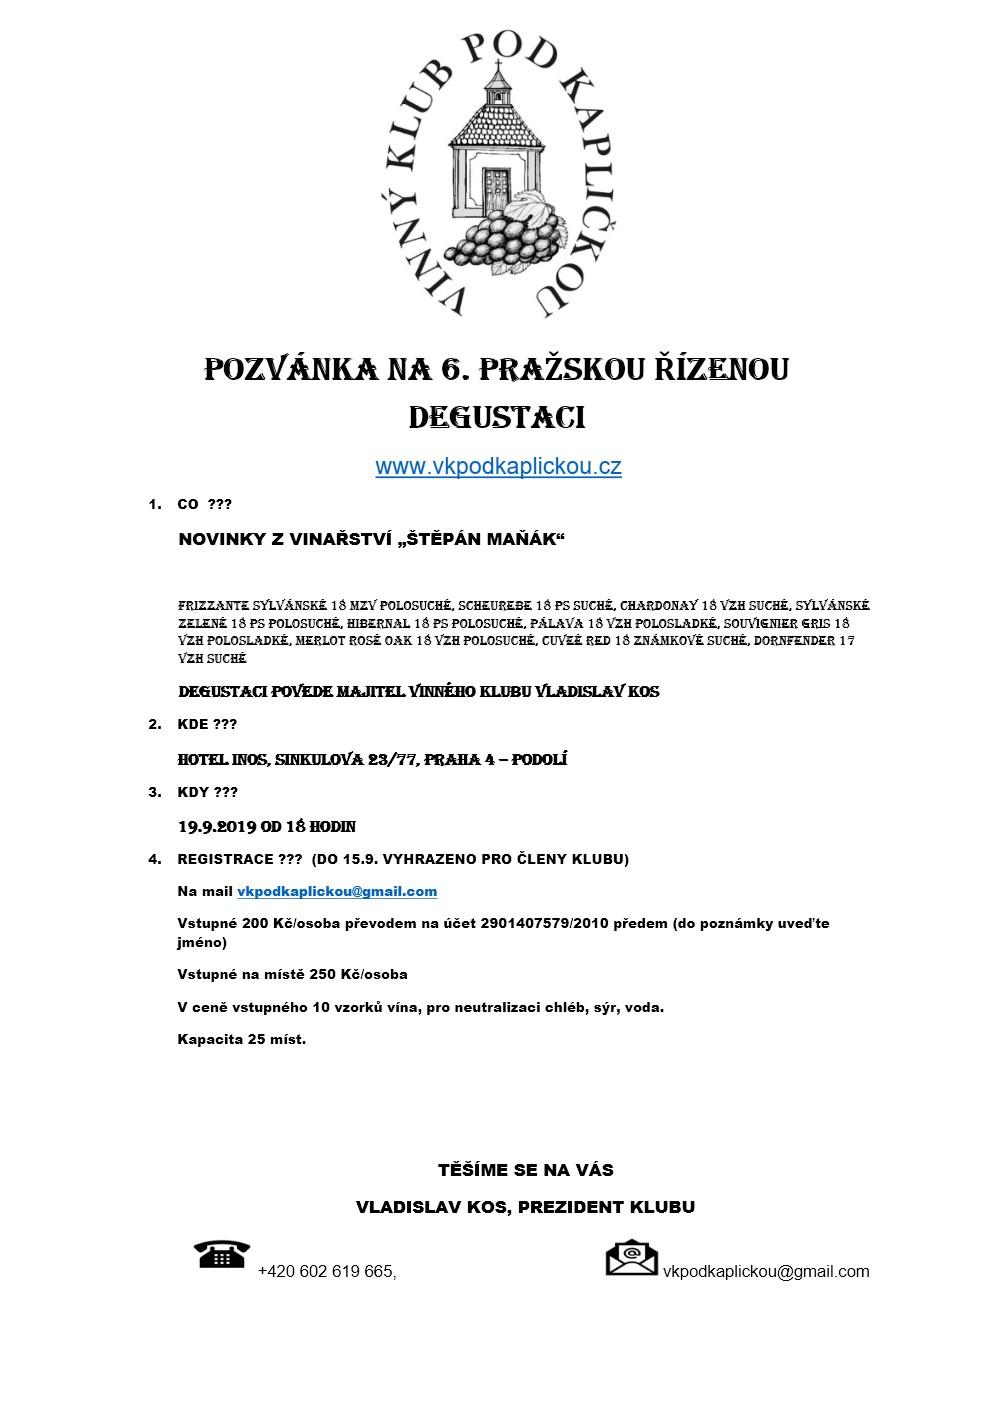 Pozvánka na 6.pražskou degustaci